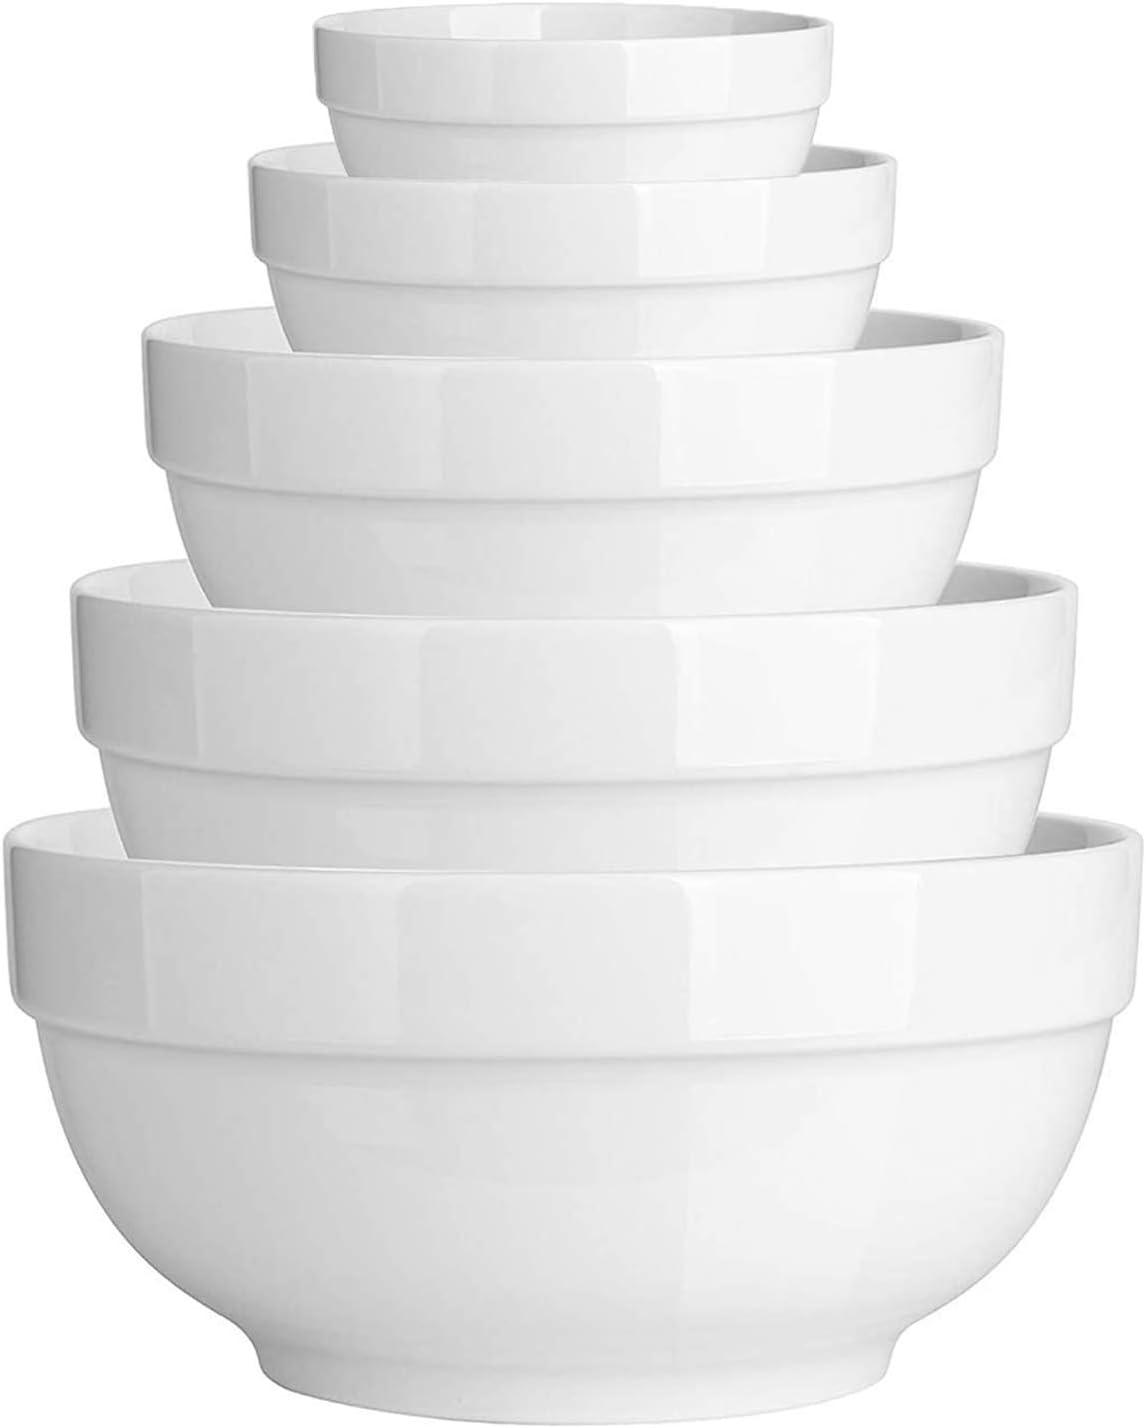 White Ceramic Dishes